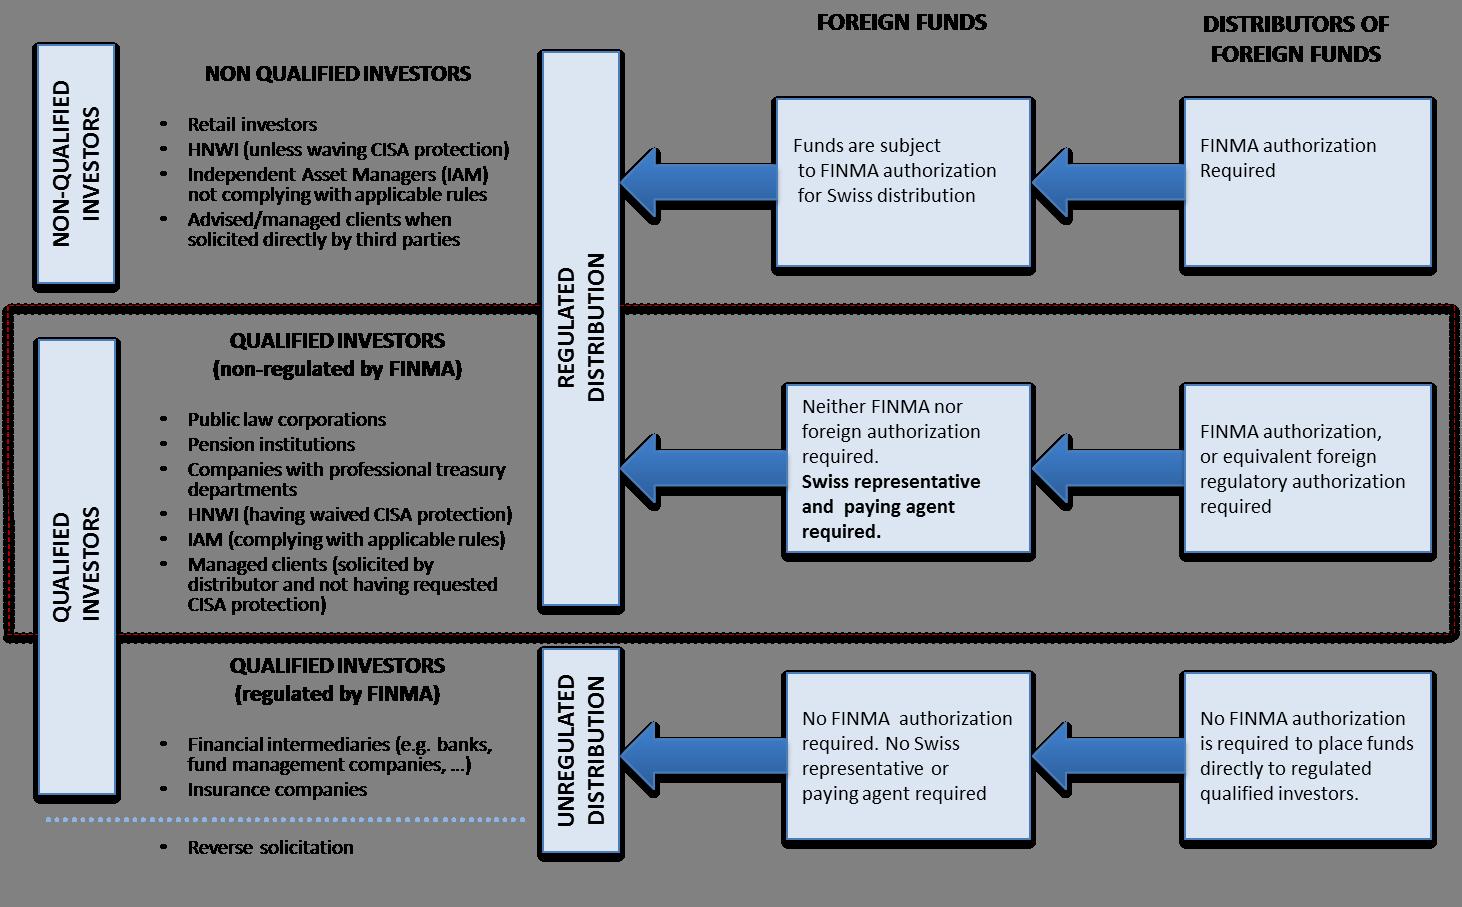 Hugo fund services swiss distribution flowchart swiss distribution flowchart nvjuhfo Choice Image